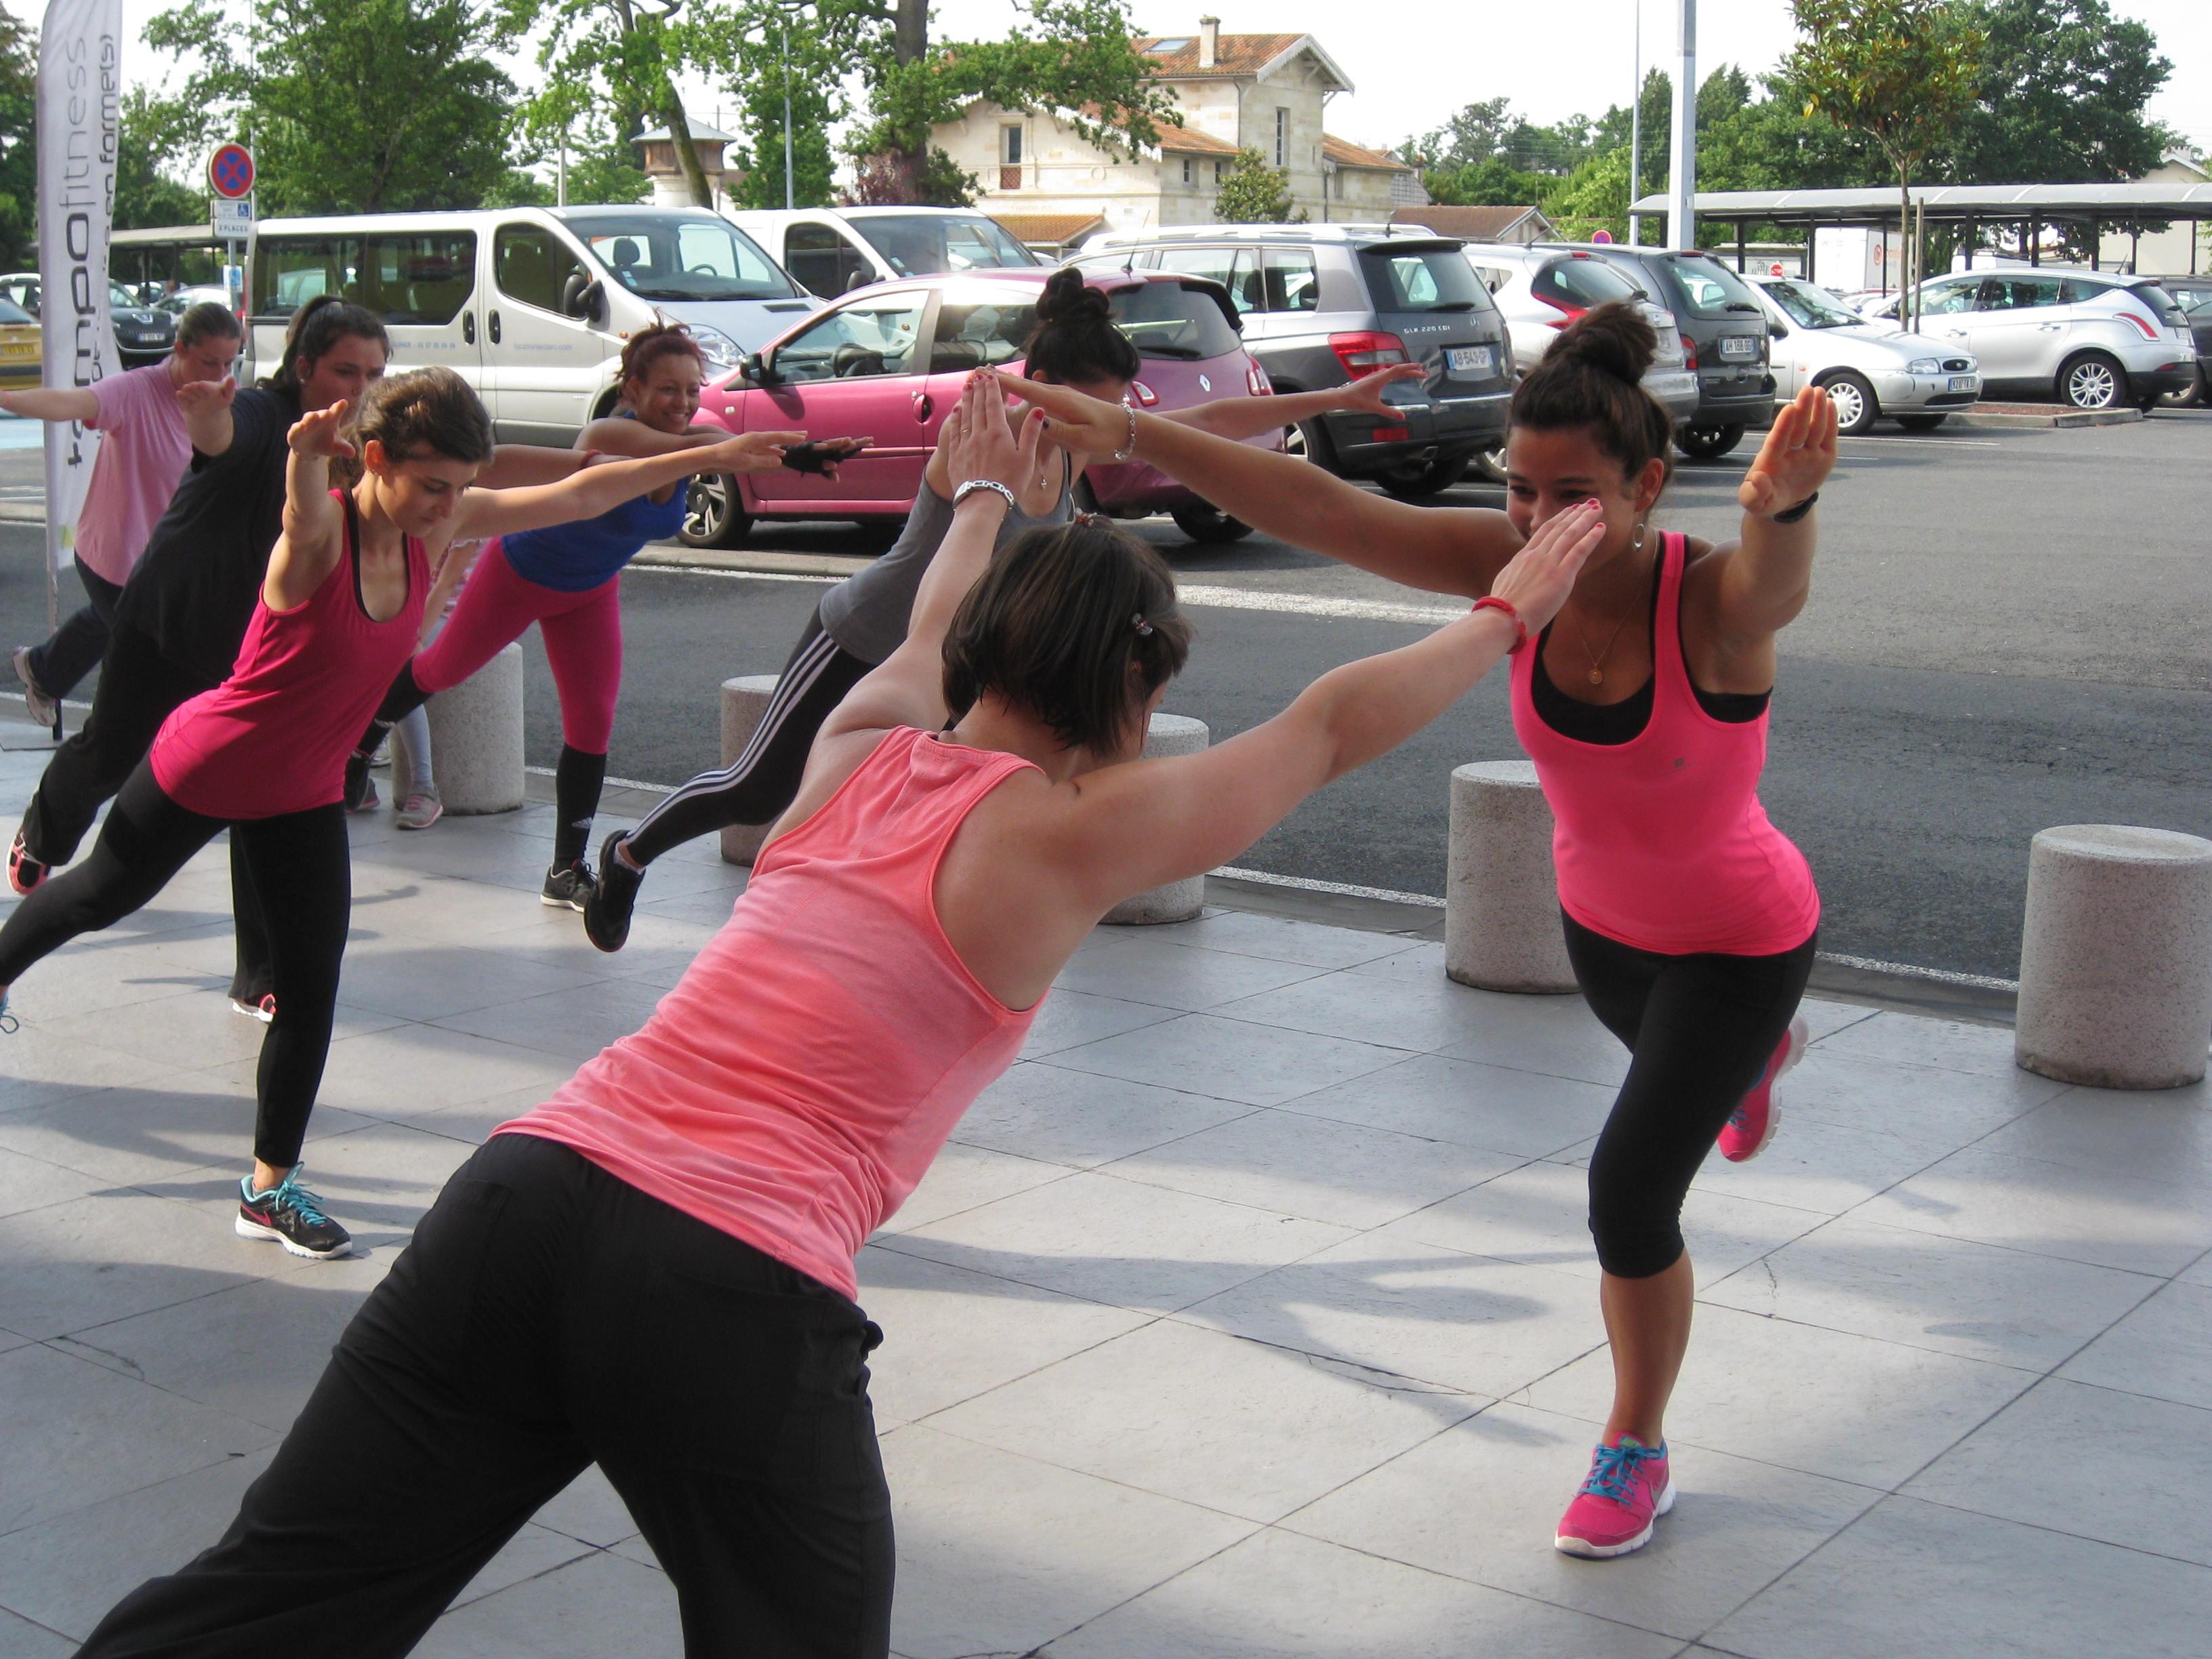 Photos : Boxez, Dansez, BOUGEZ !